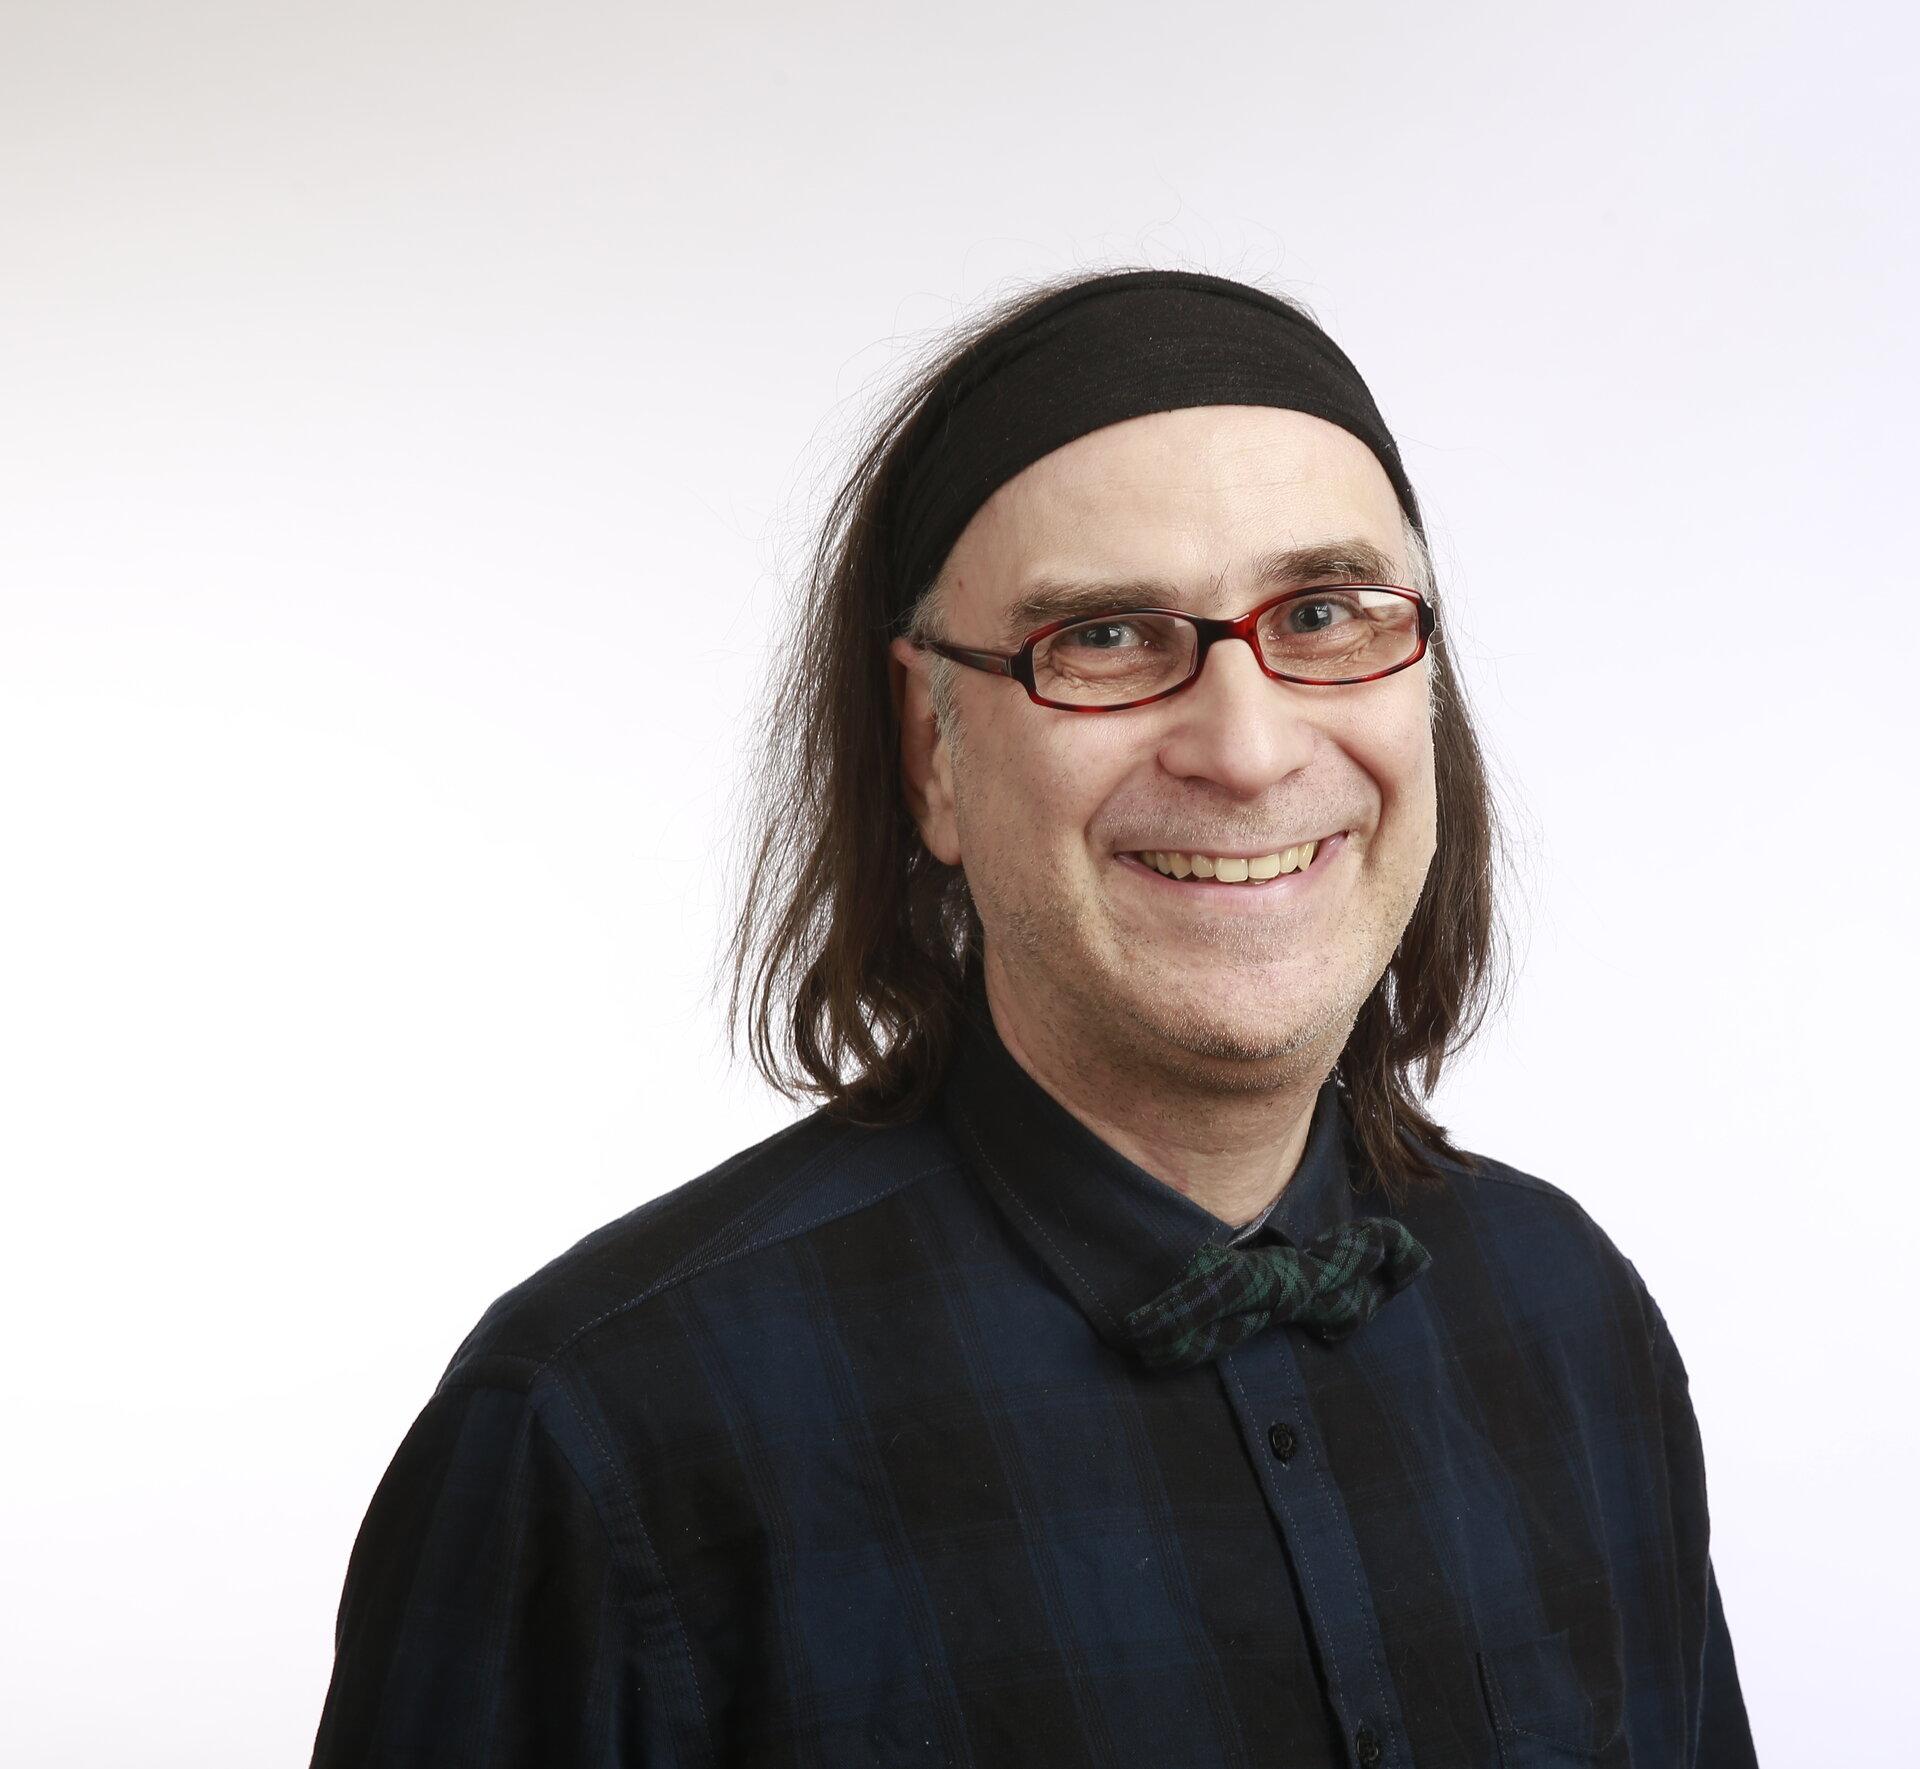 Markus Schulte-Hötzel